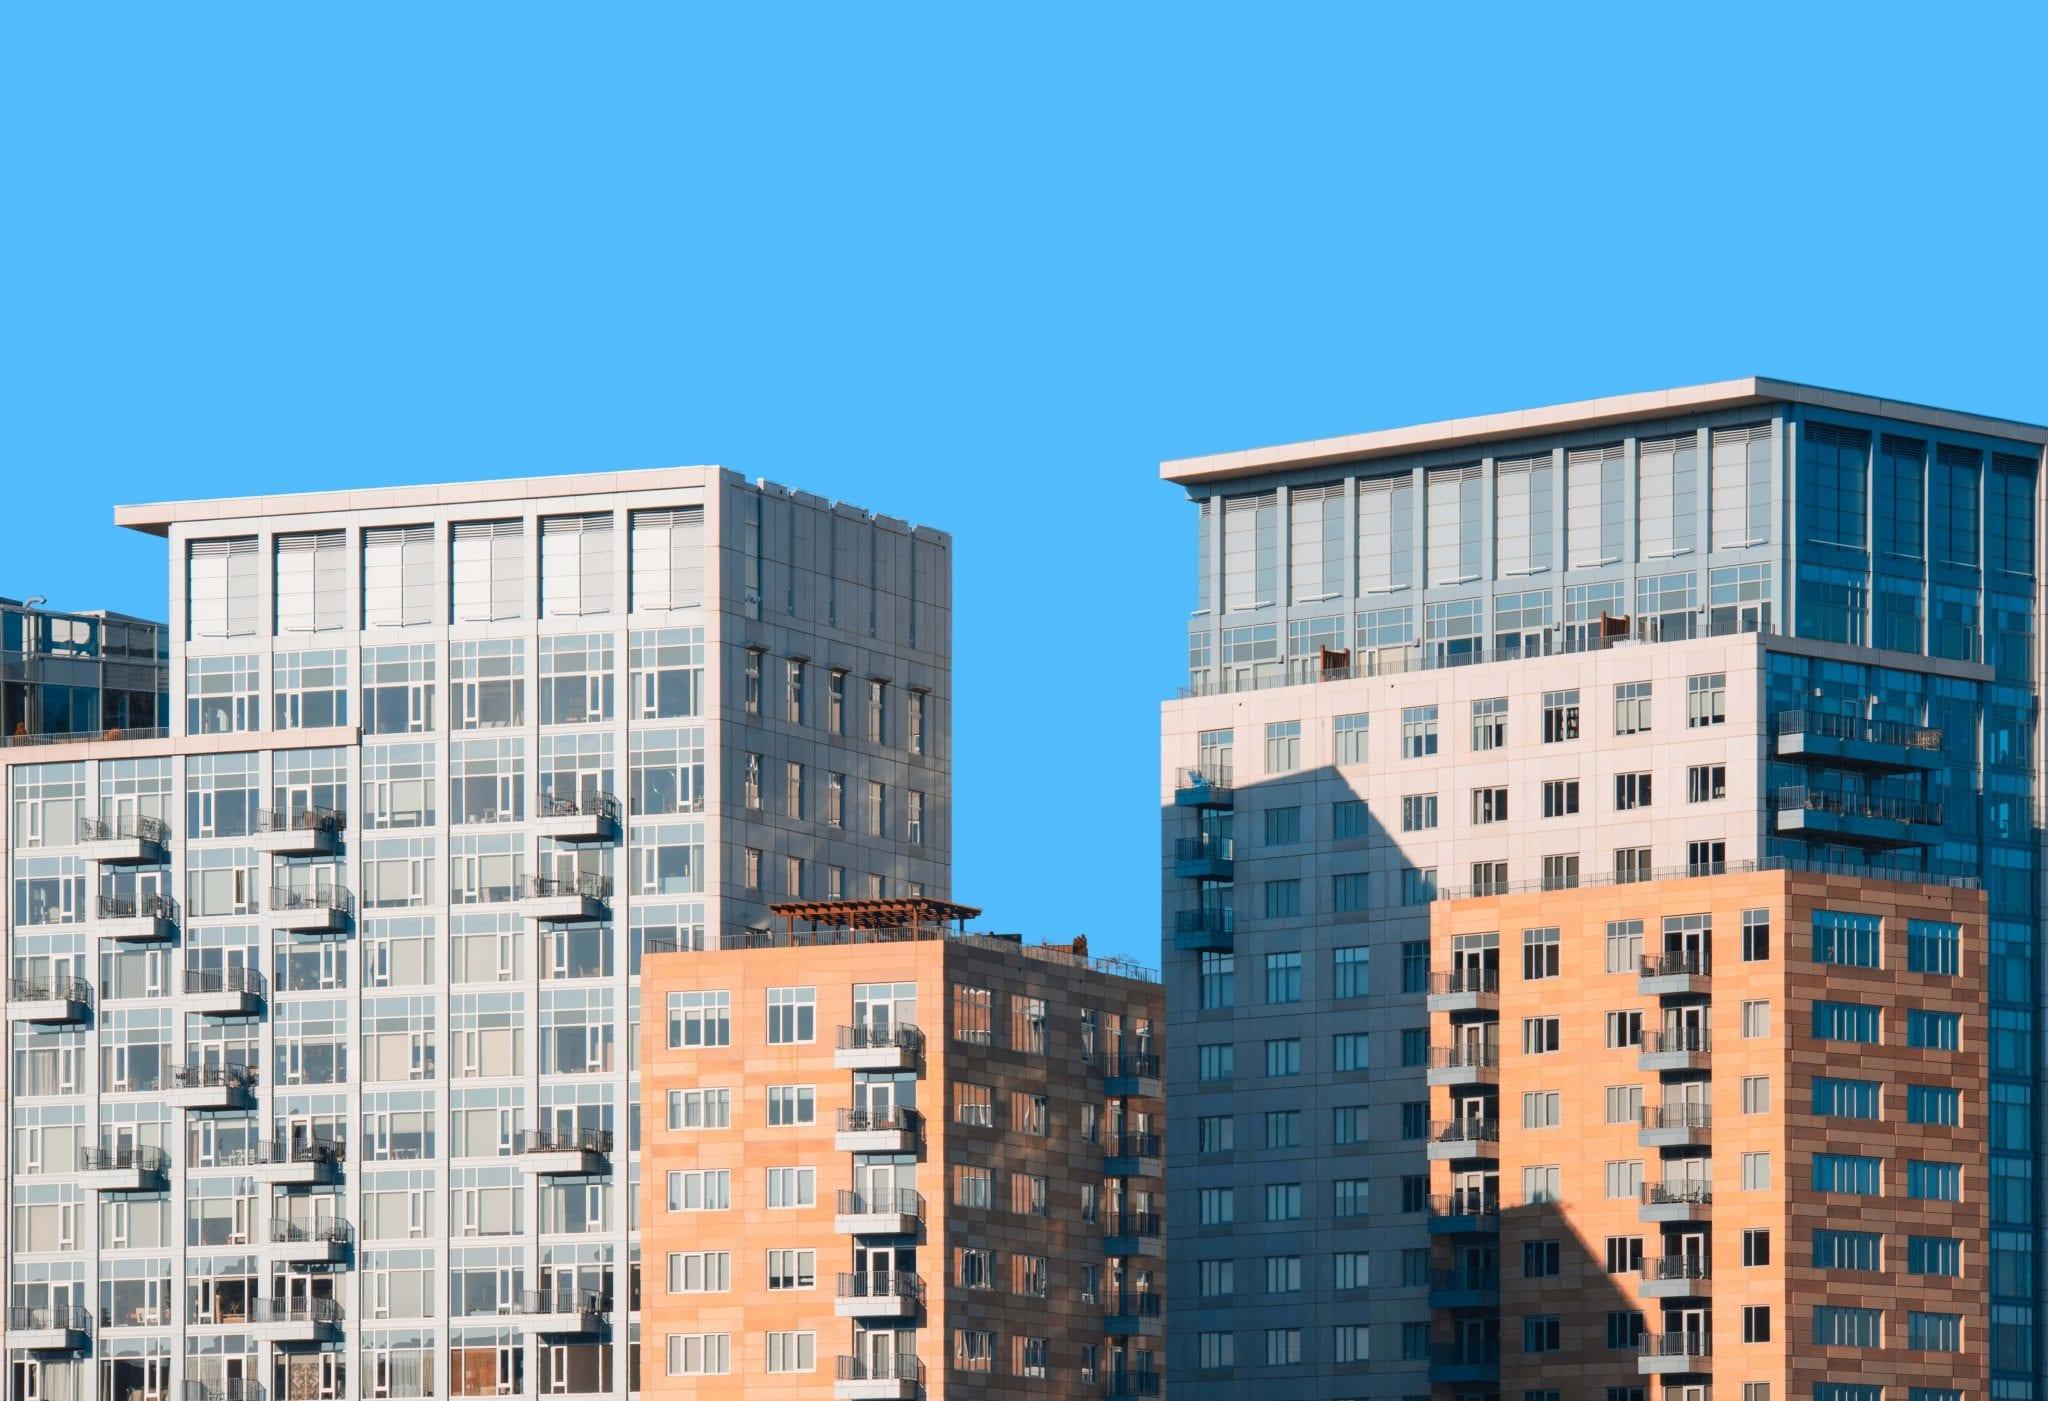 Les prix de l'immobilier neuf s'envolent en France